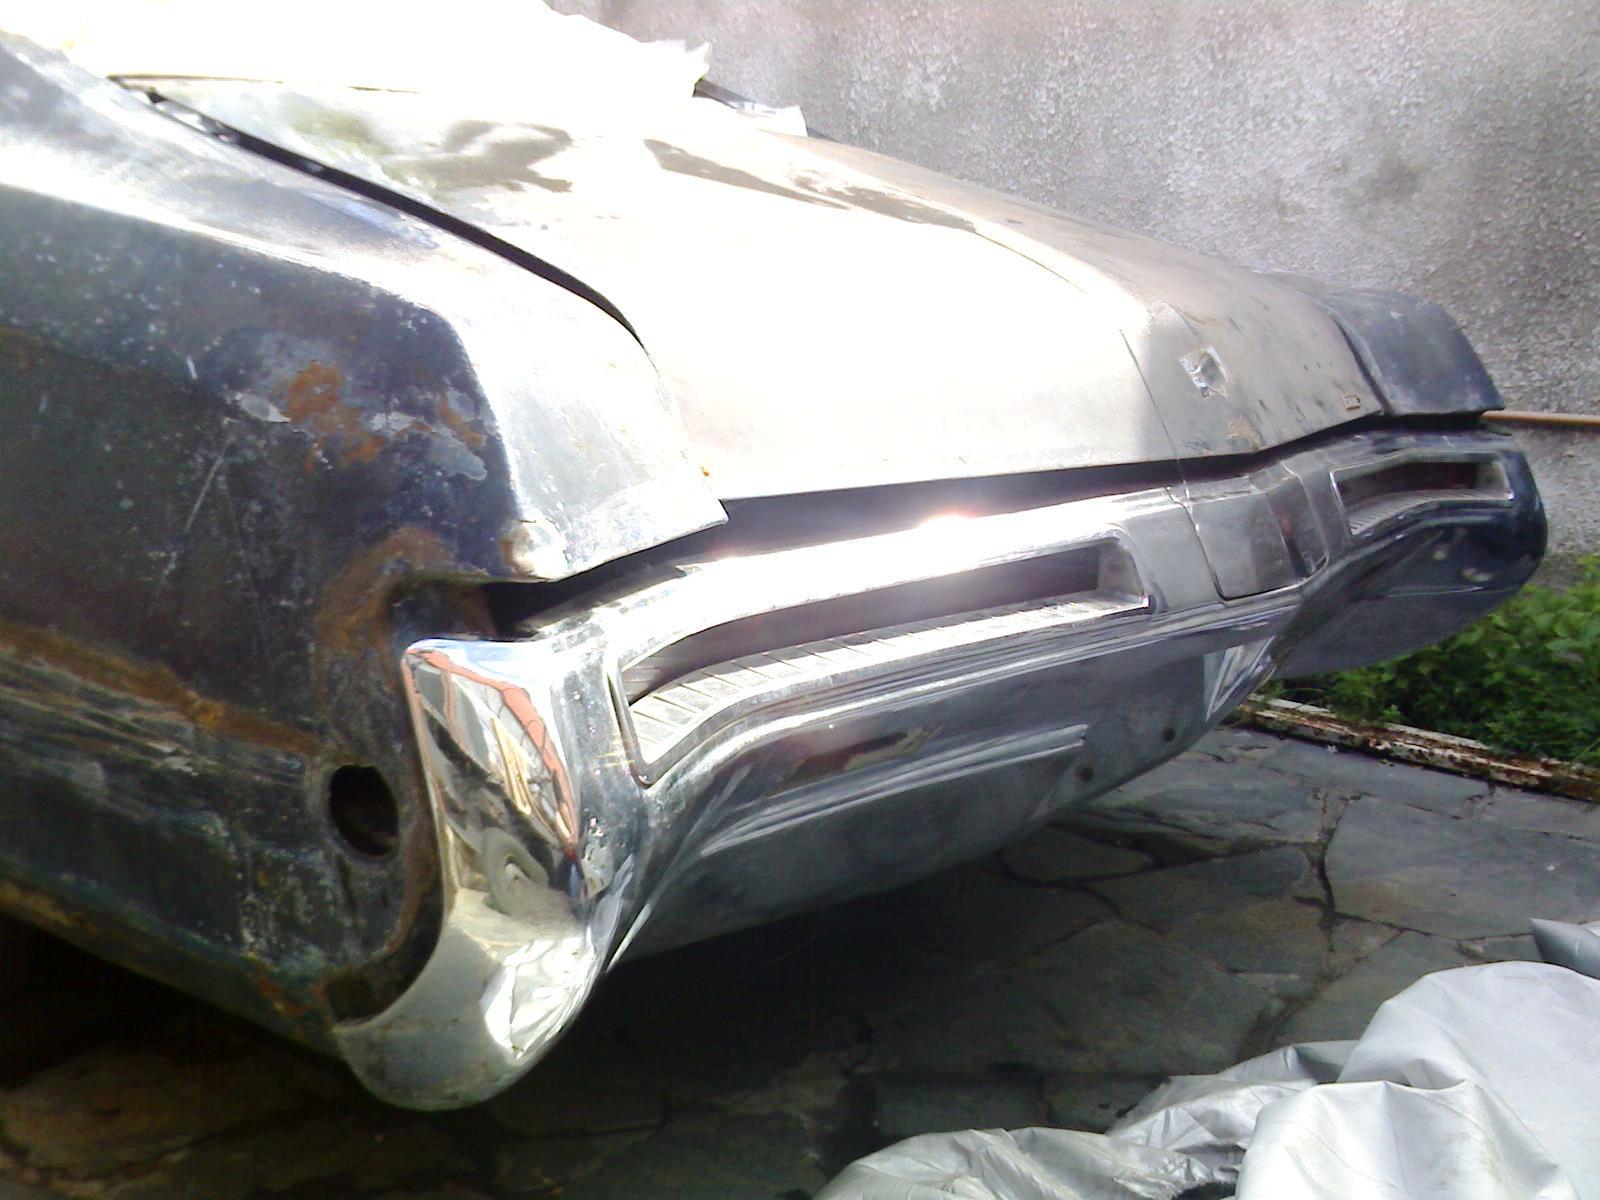 19-09-09_1418 Buick Riviera (1969)